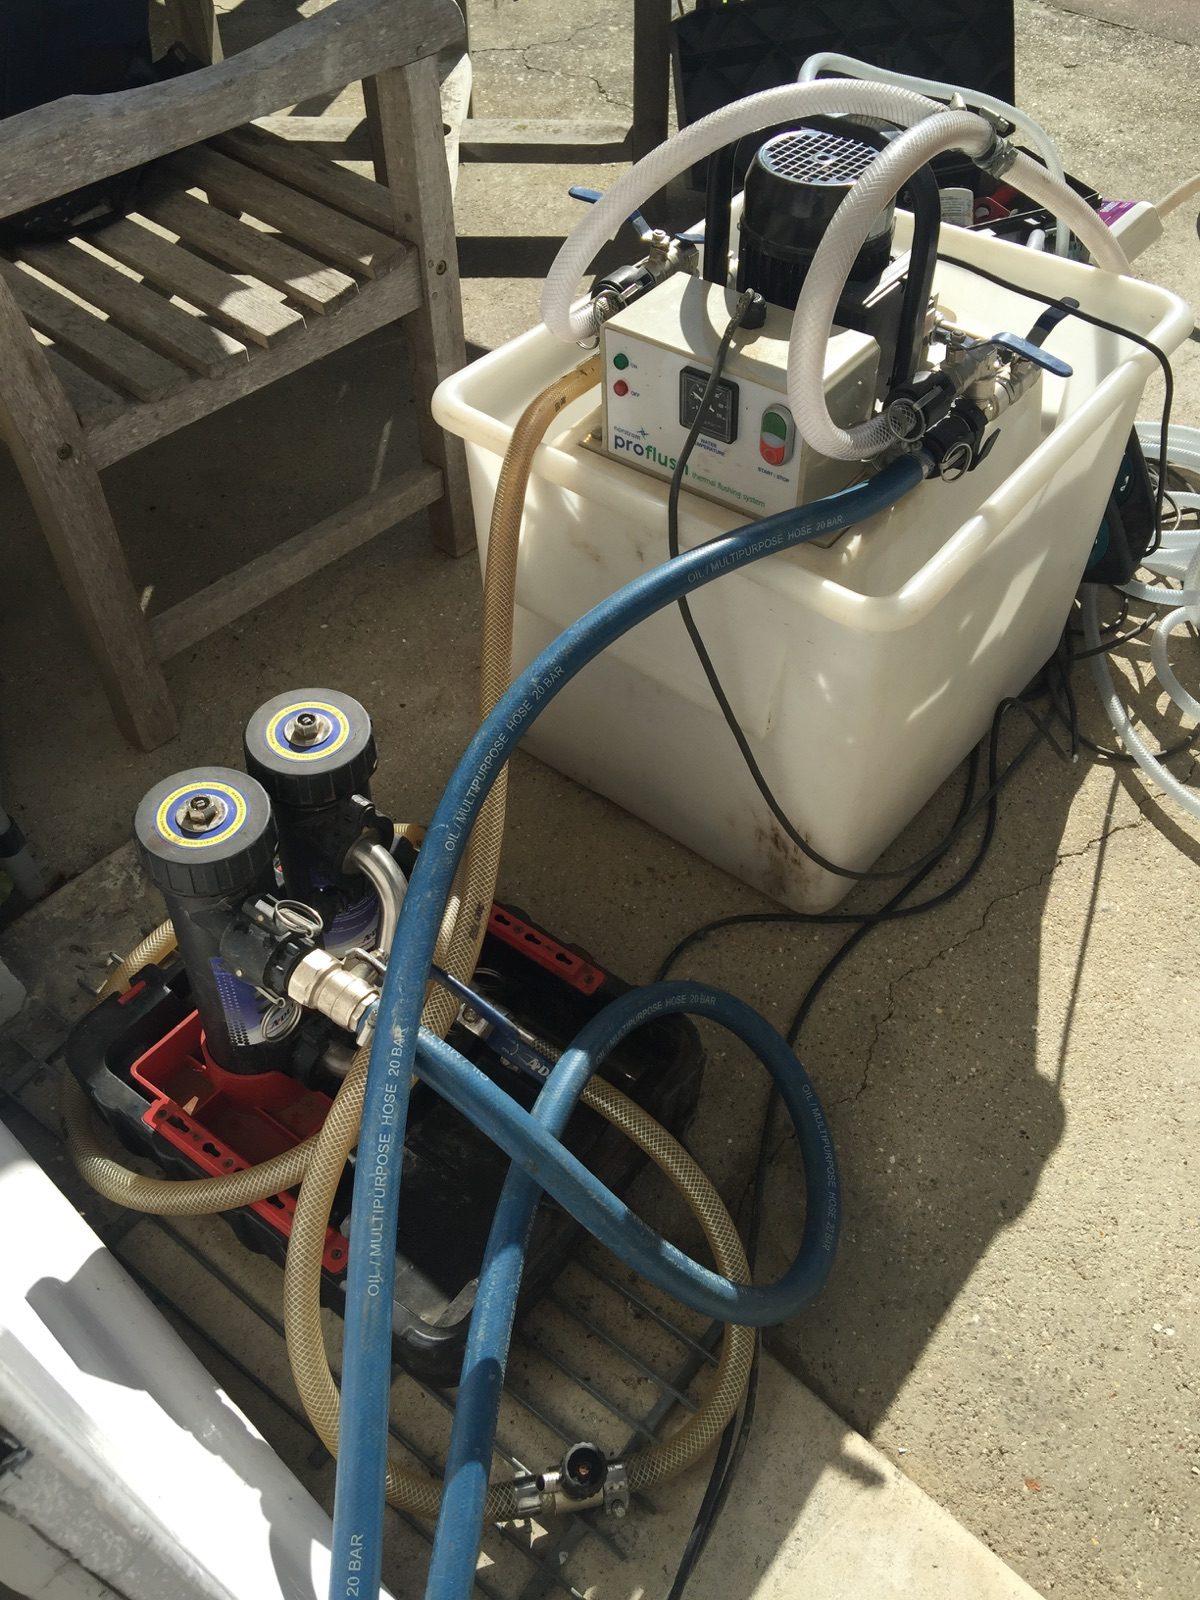 https://here4heat.com/wp-content/uploads/2015/07/Norstrom-Powerflusher-and-Magnaclean-Pro-1200x1600.jpg